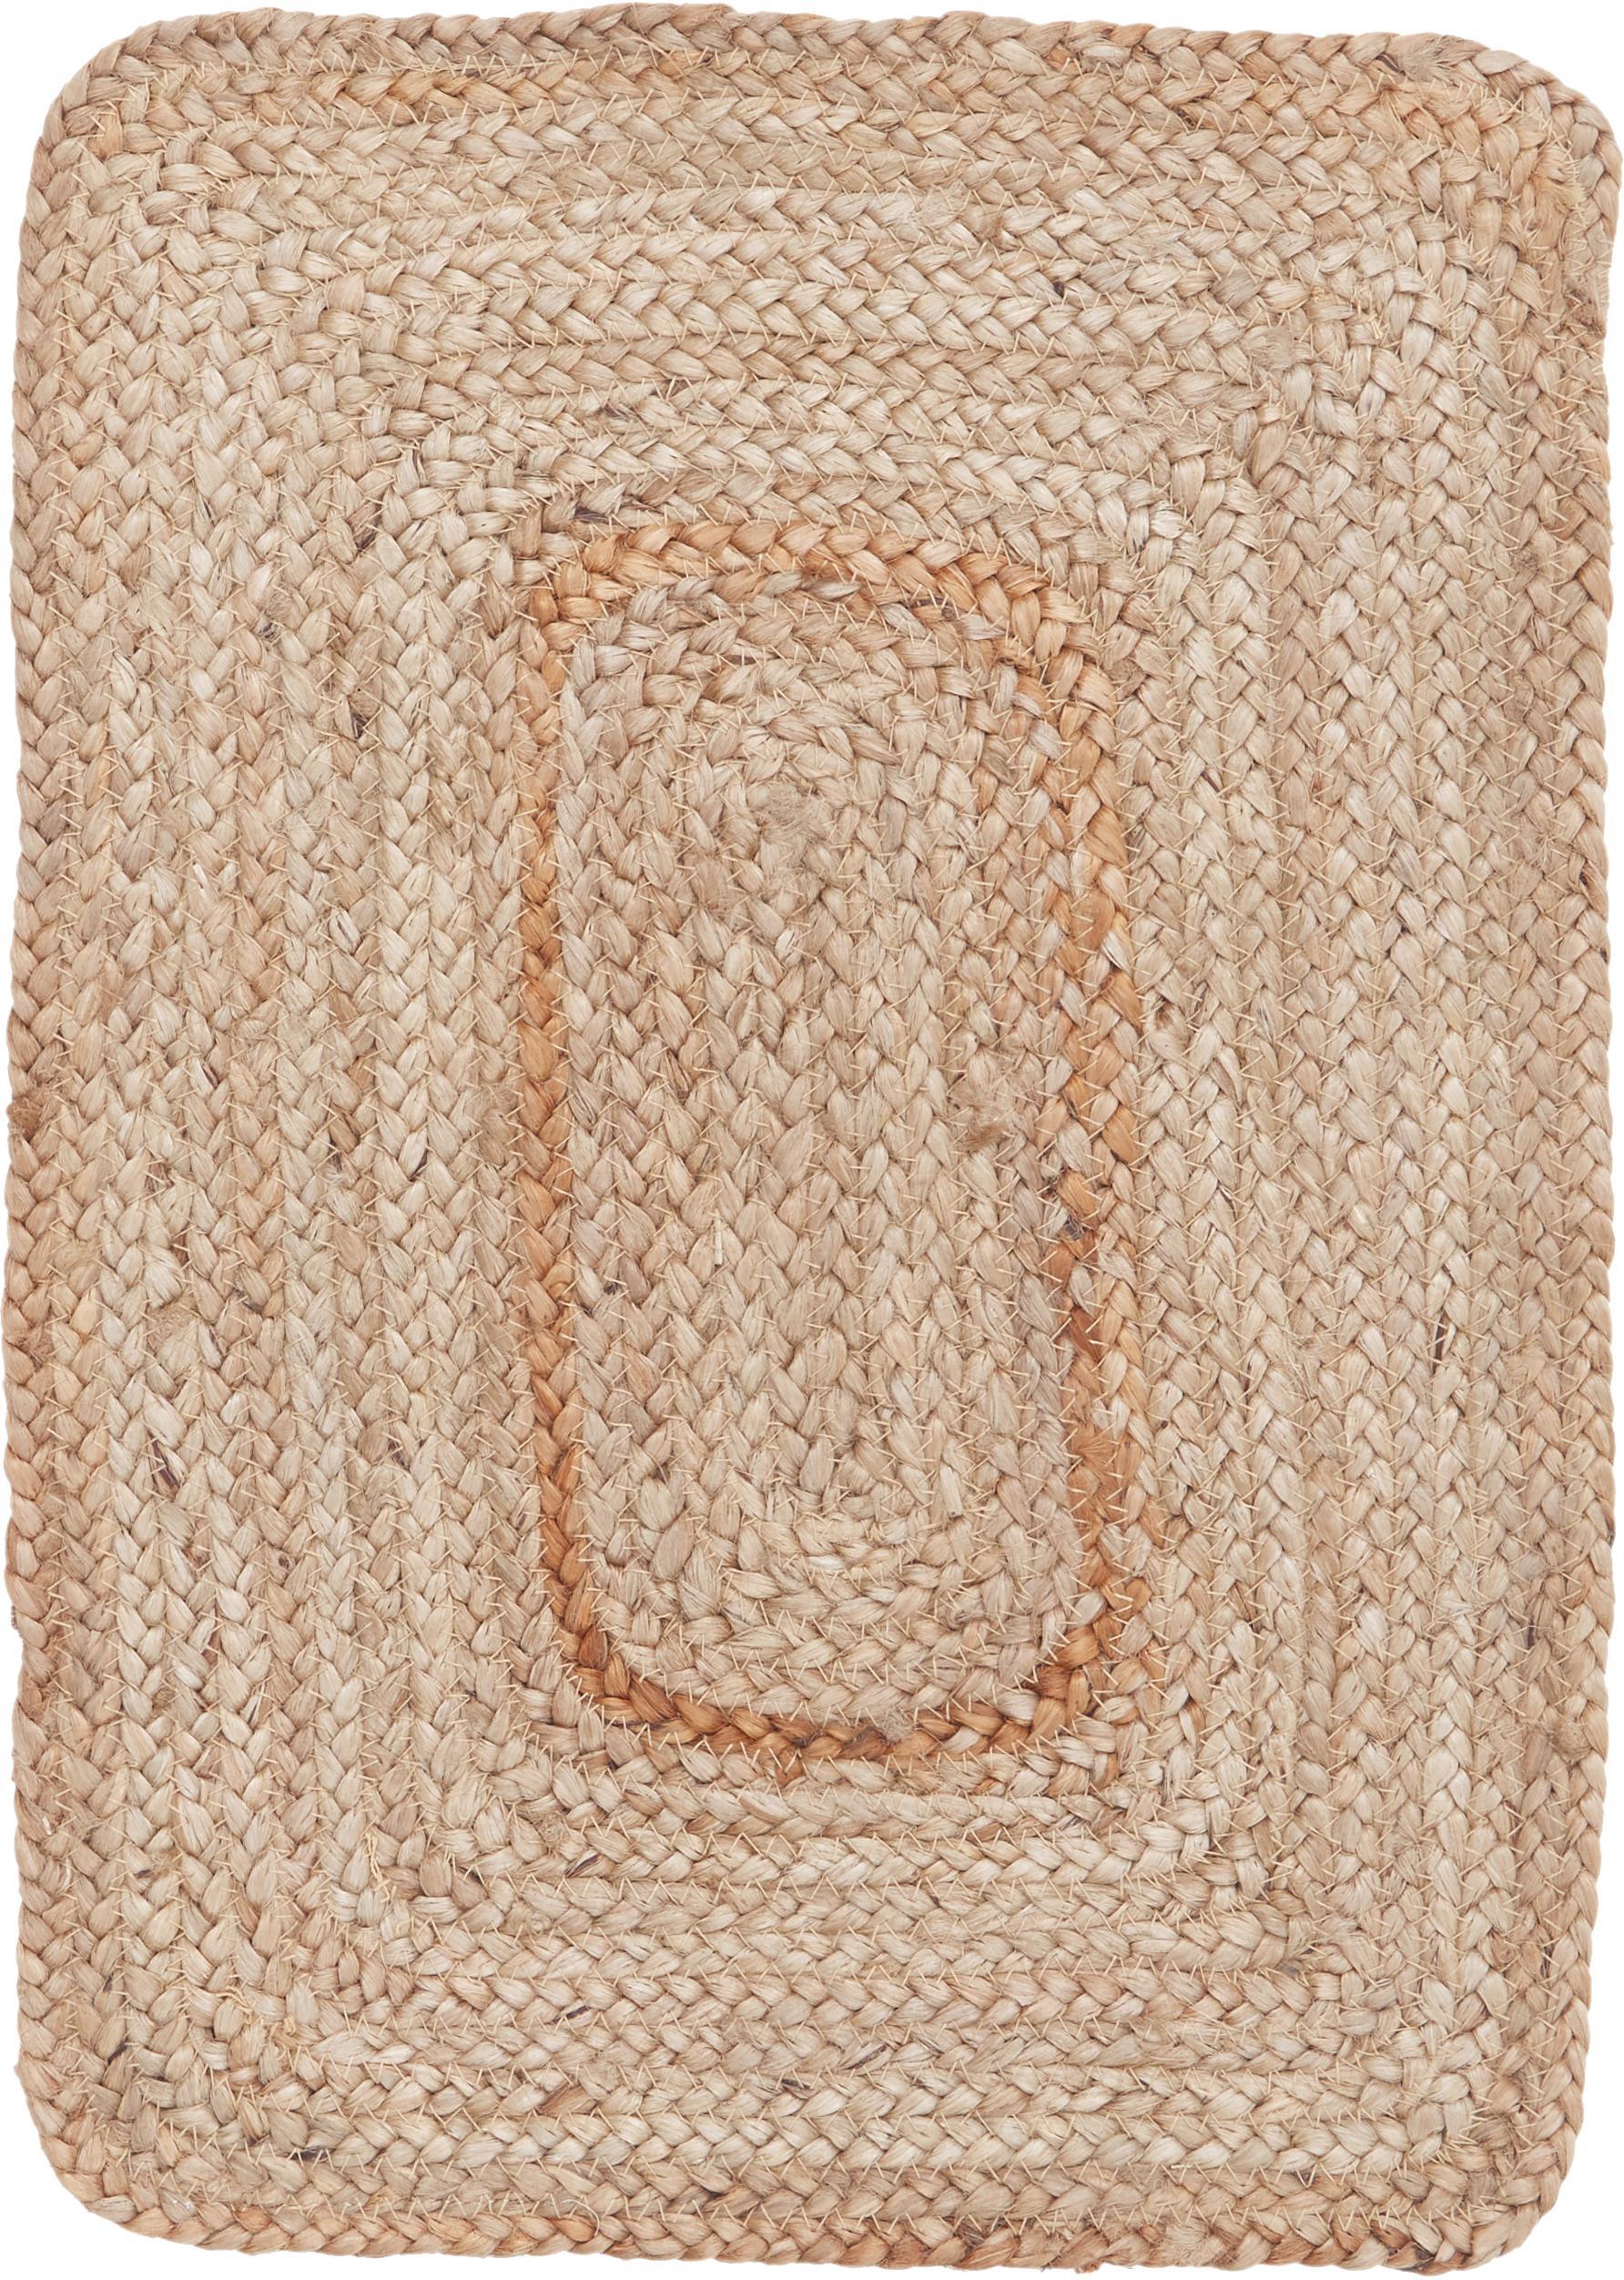 Jute placemats Ural, 2 stuks, Jute, Jutekleurig, 35 x 50 cm